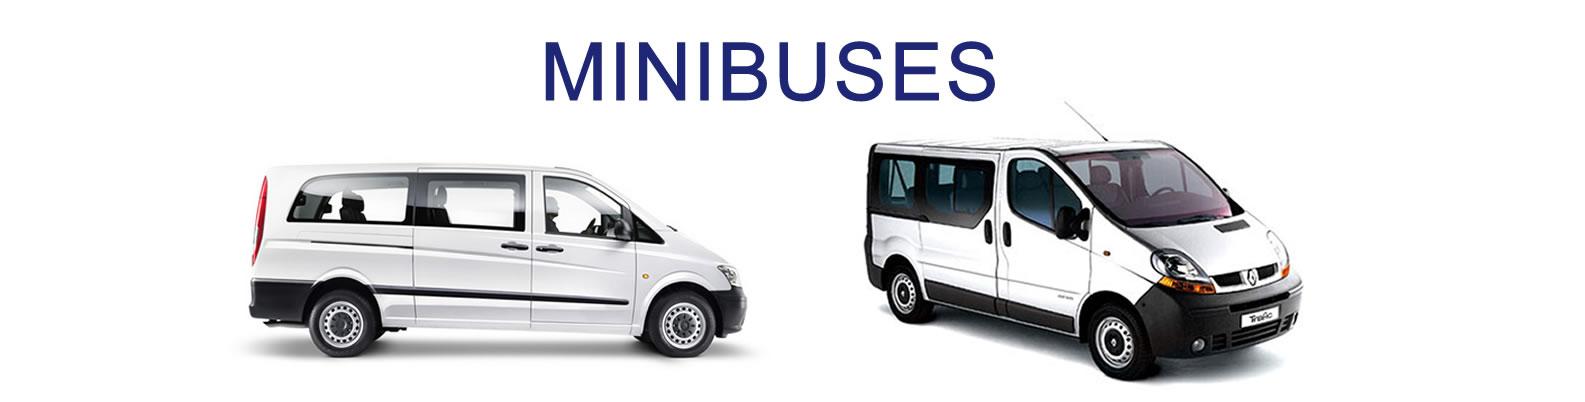 minibusesslides